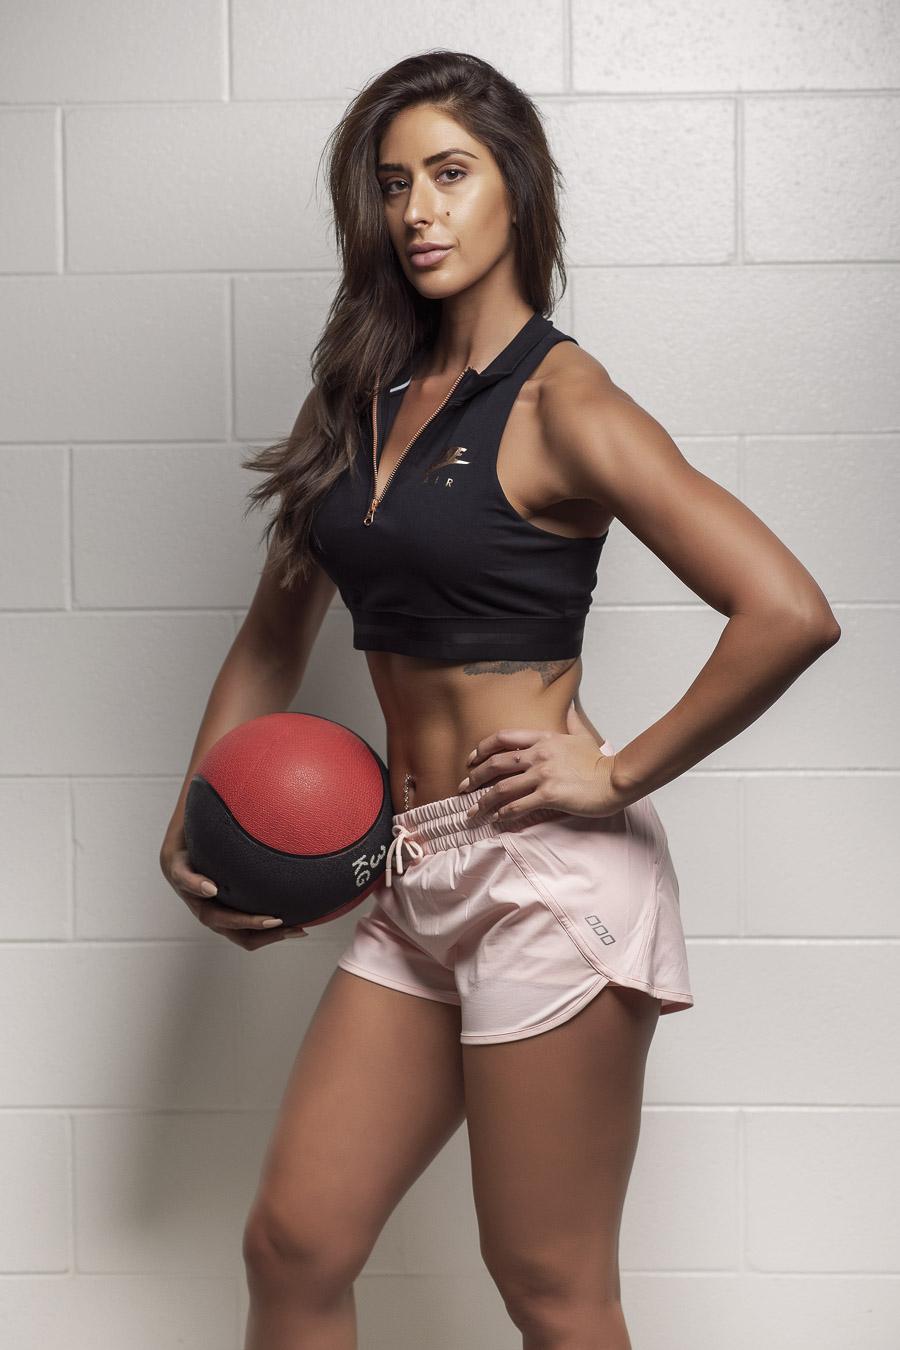 Cassie Adelaides latest female fitness sensation holding medicine ball during fitness shoot